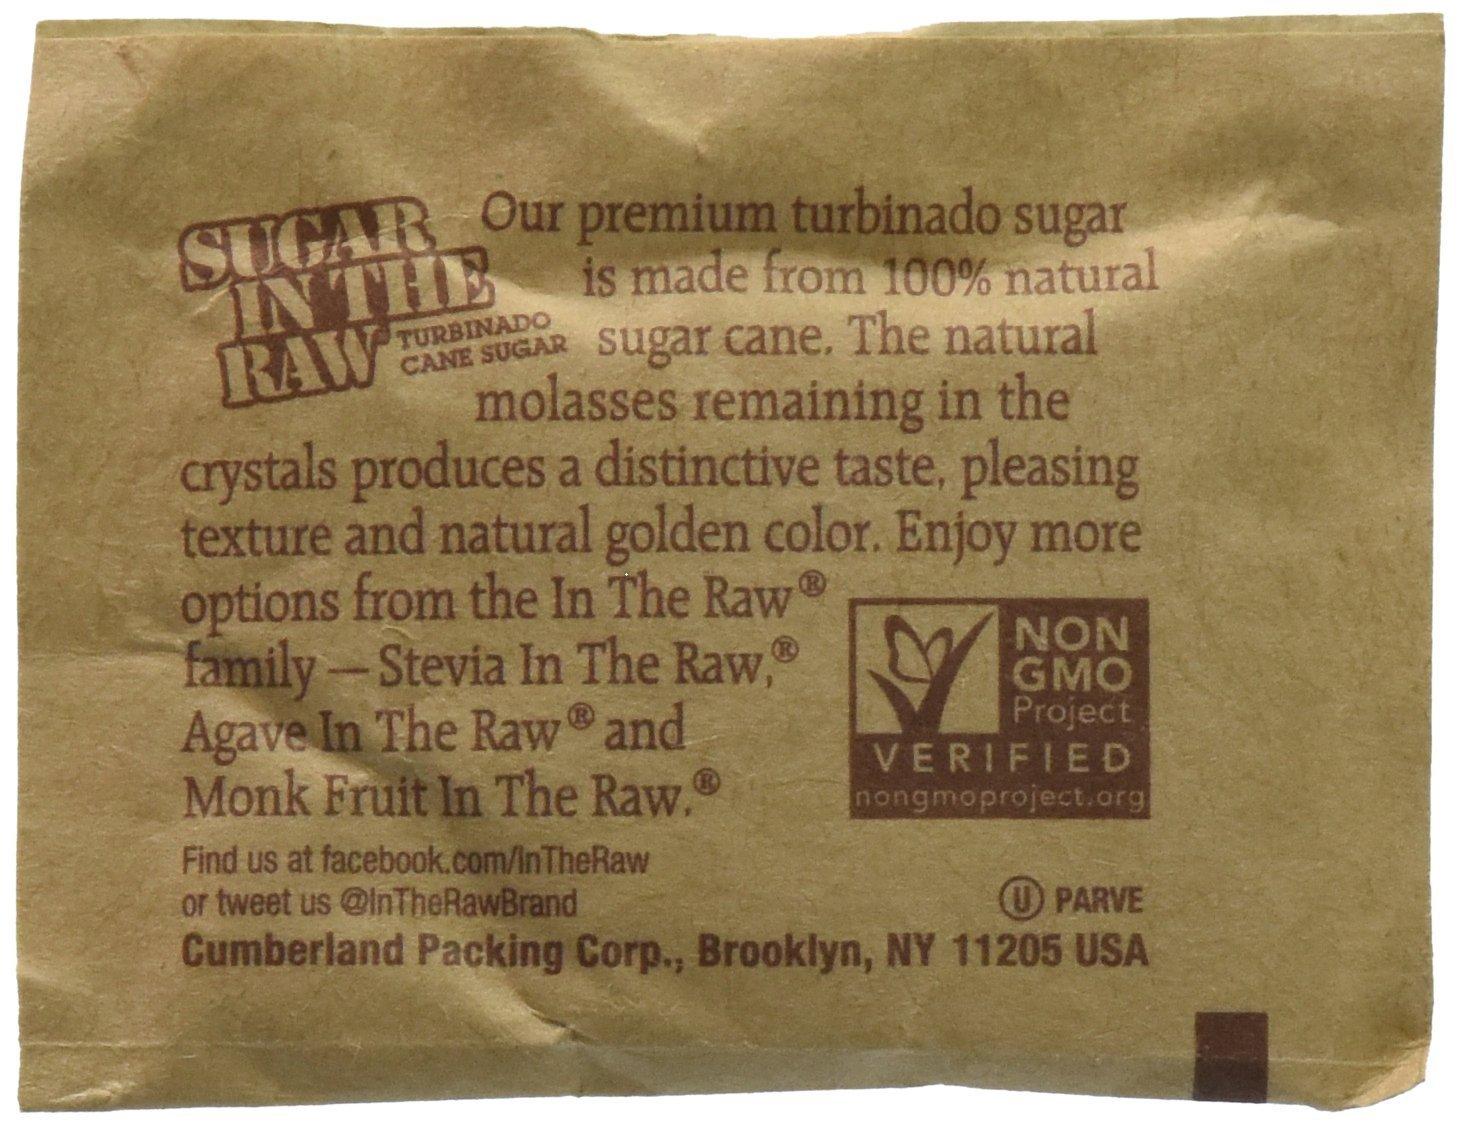 Sugar in the Raw / Raw Sugar Natural Cane Turbinado from Hawaii (750 count) by Sugar in the Raw (Image #2)